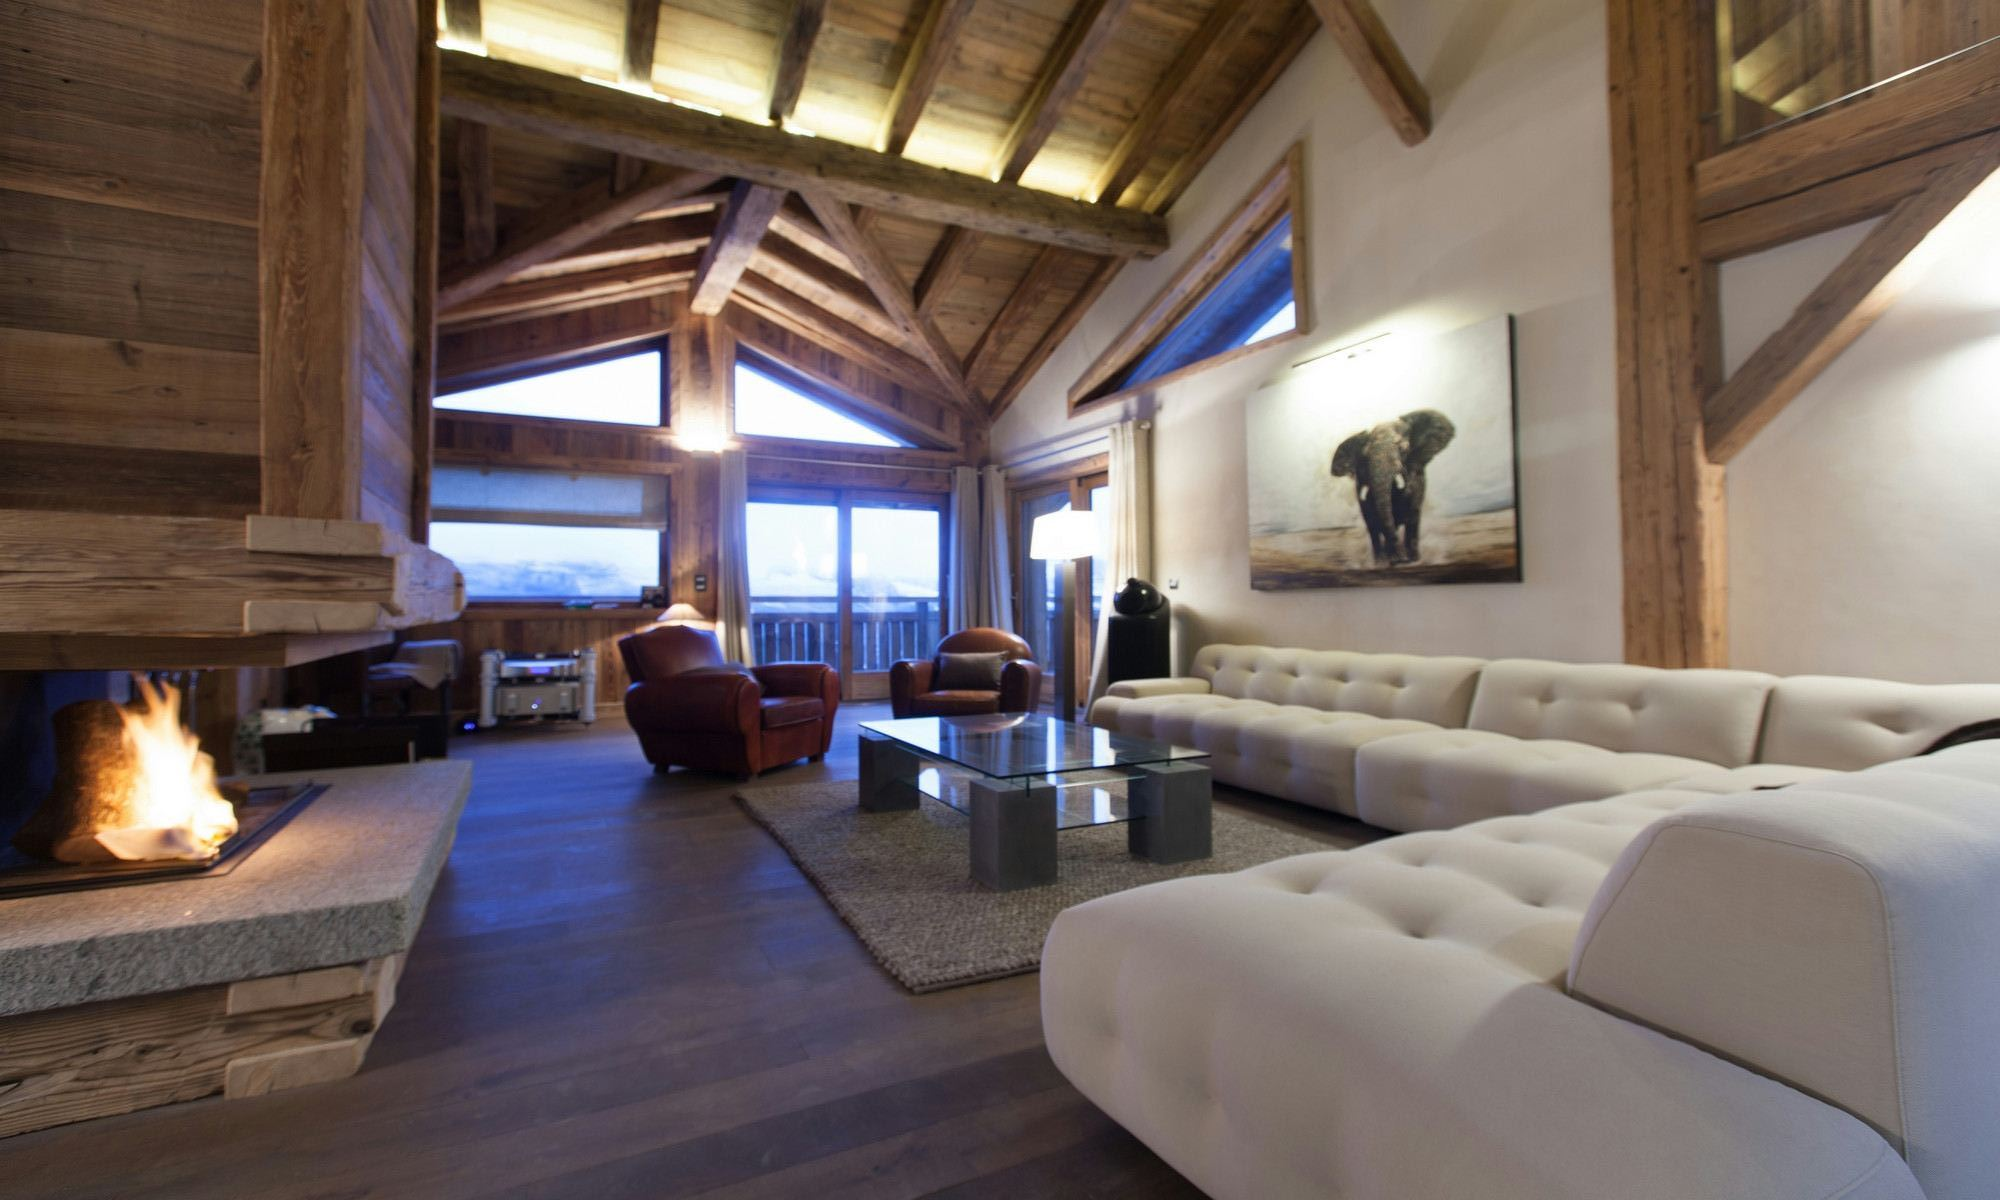 Property For Sale at Rochebrune Megève luxury Chalet Bois Joli